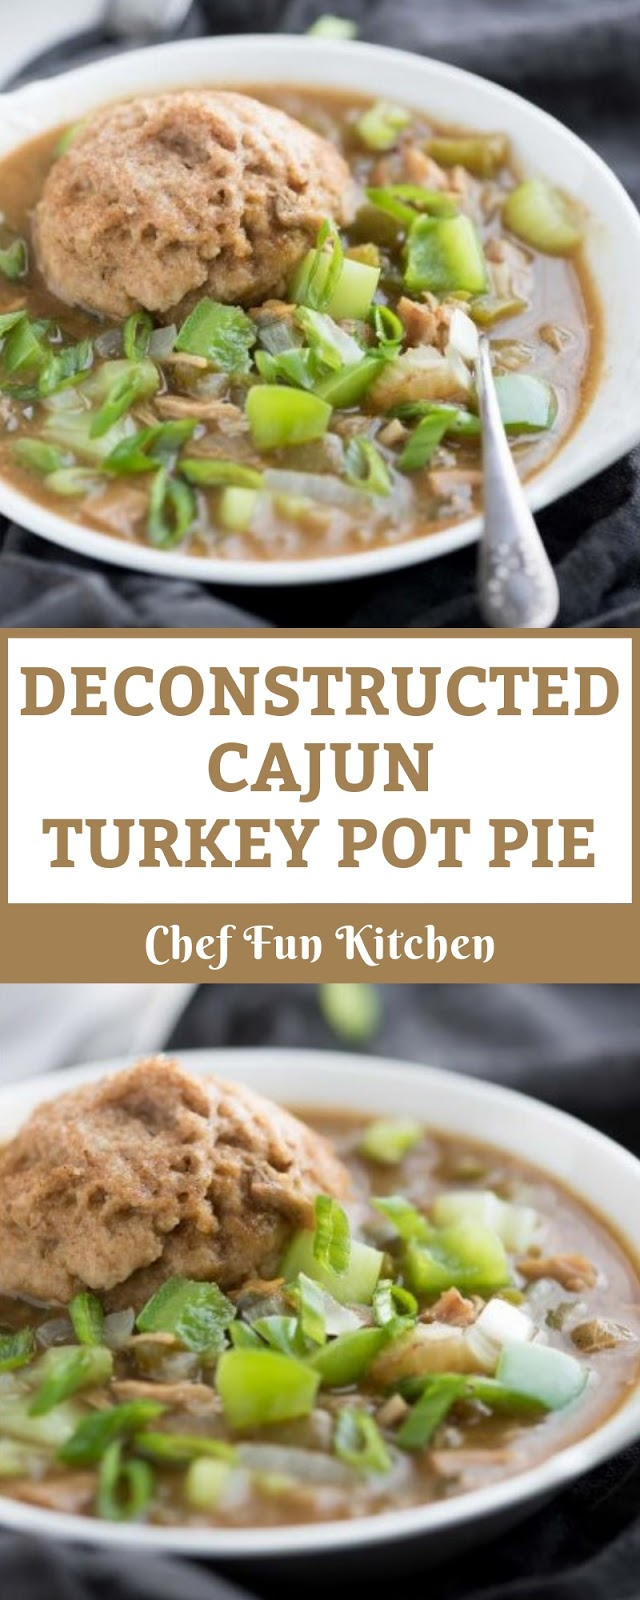 DECONSTRUCTED CAJUN TURKEY POT PIE